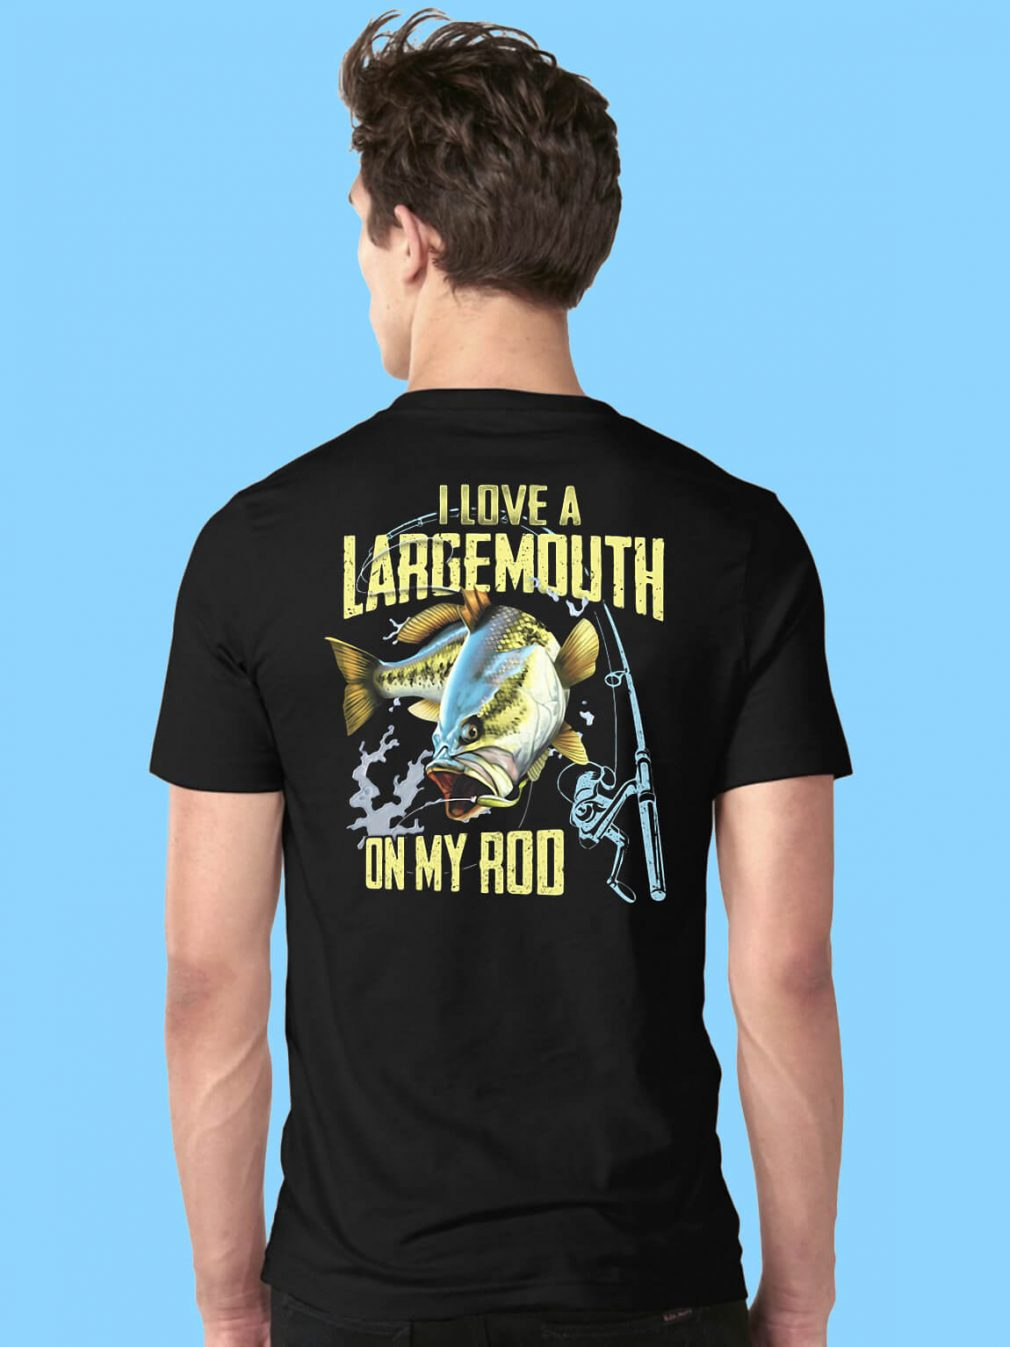 I love a Largemouth on my rod shirt